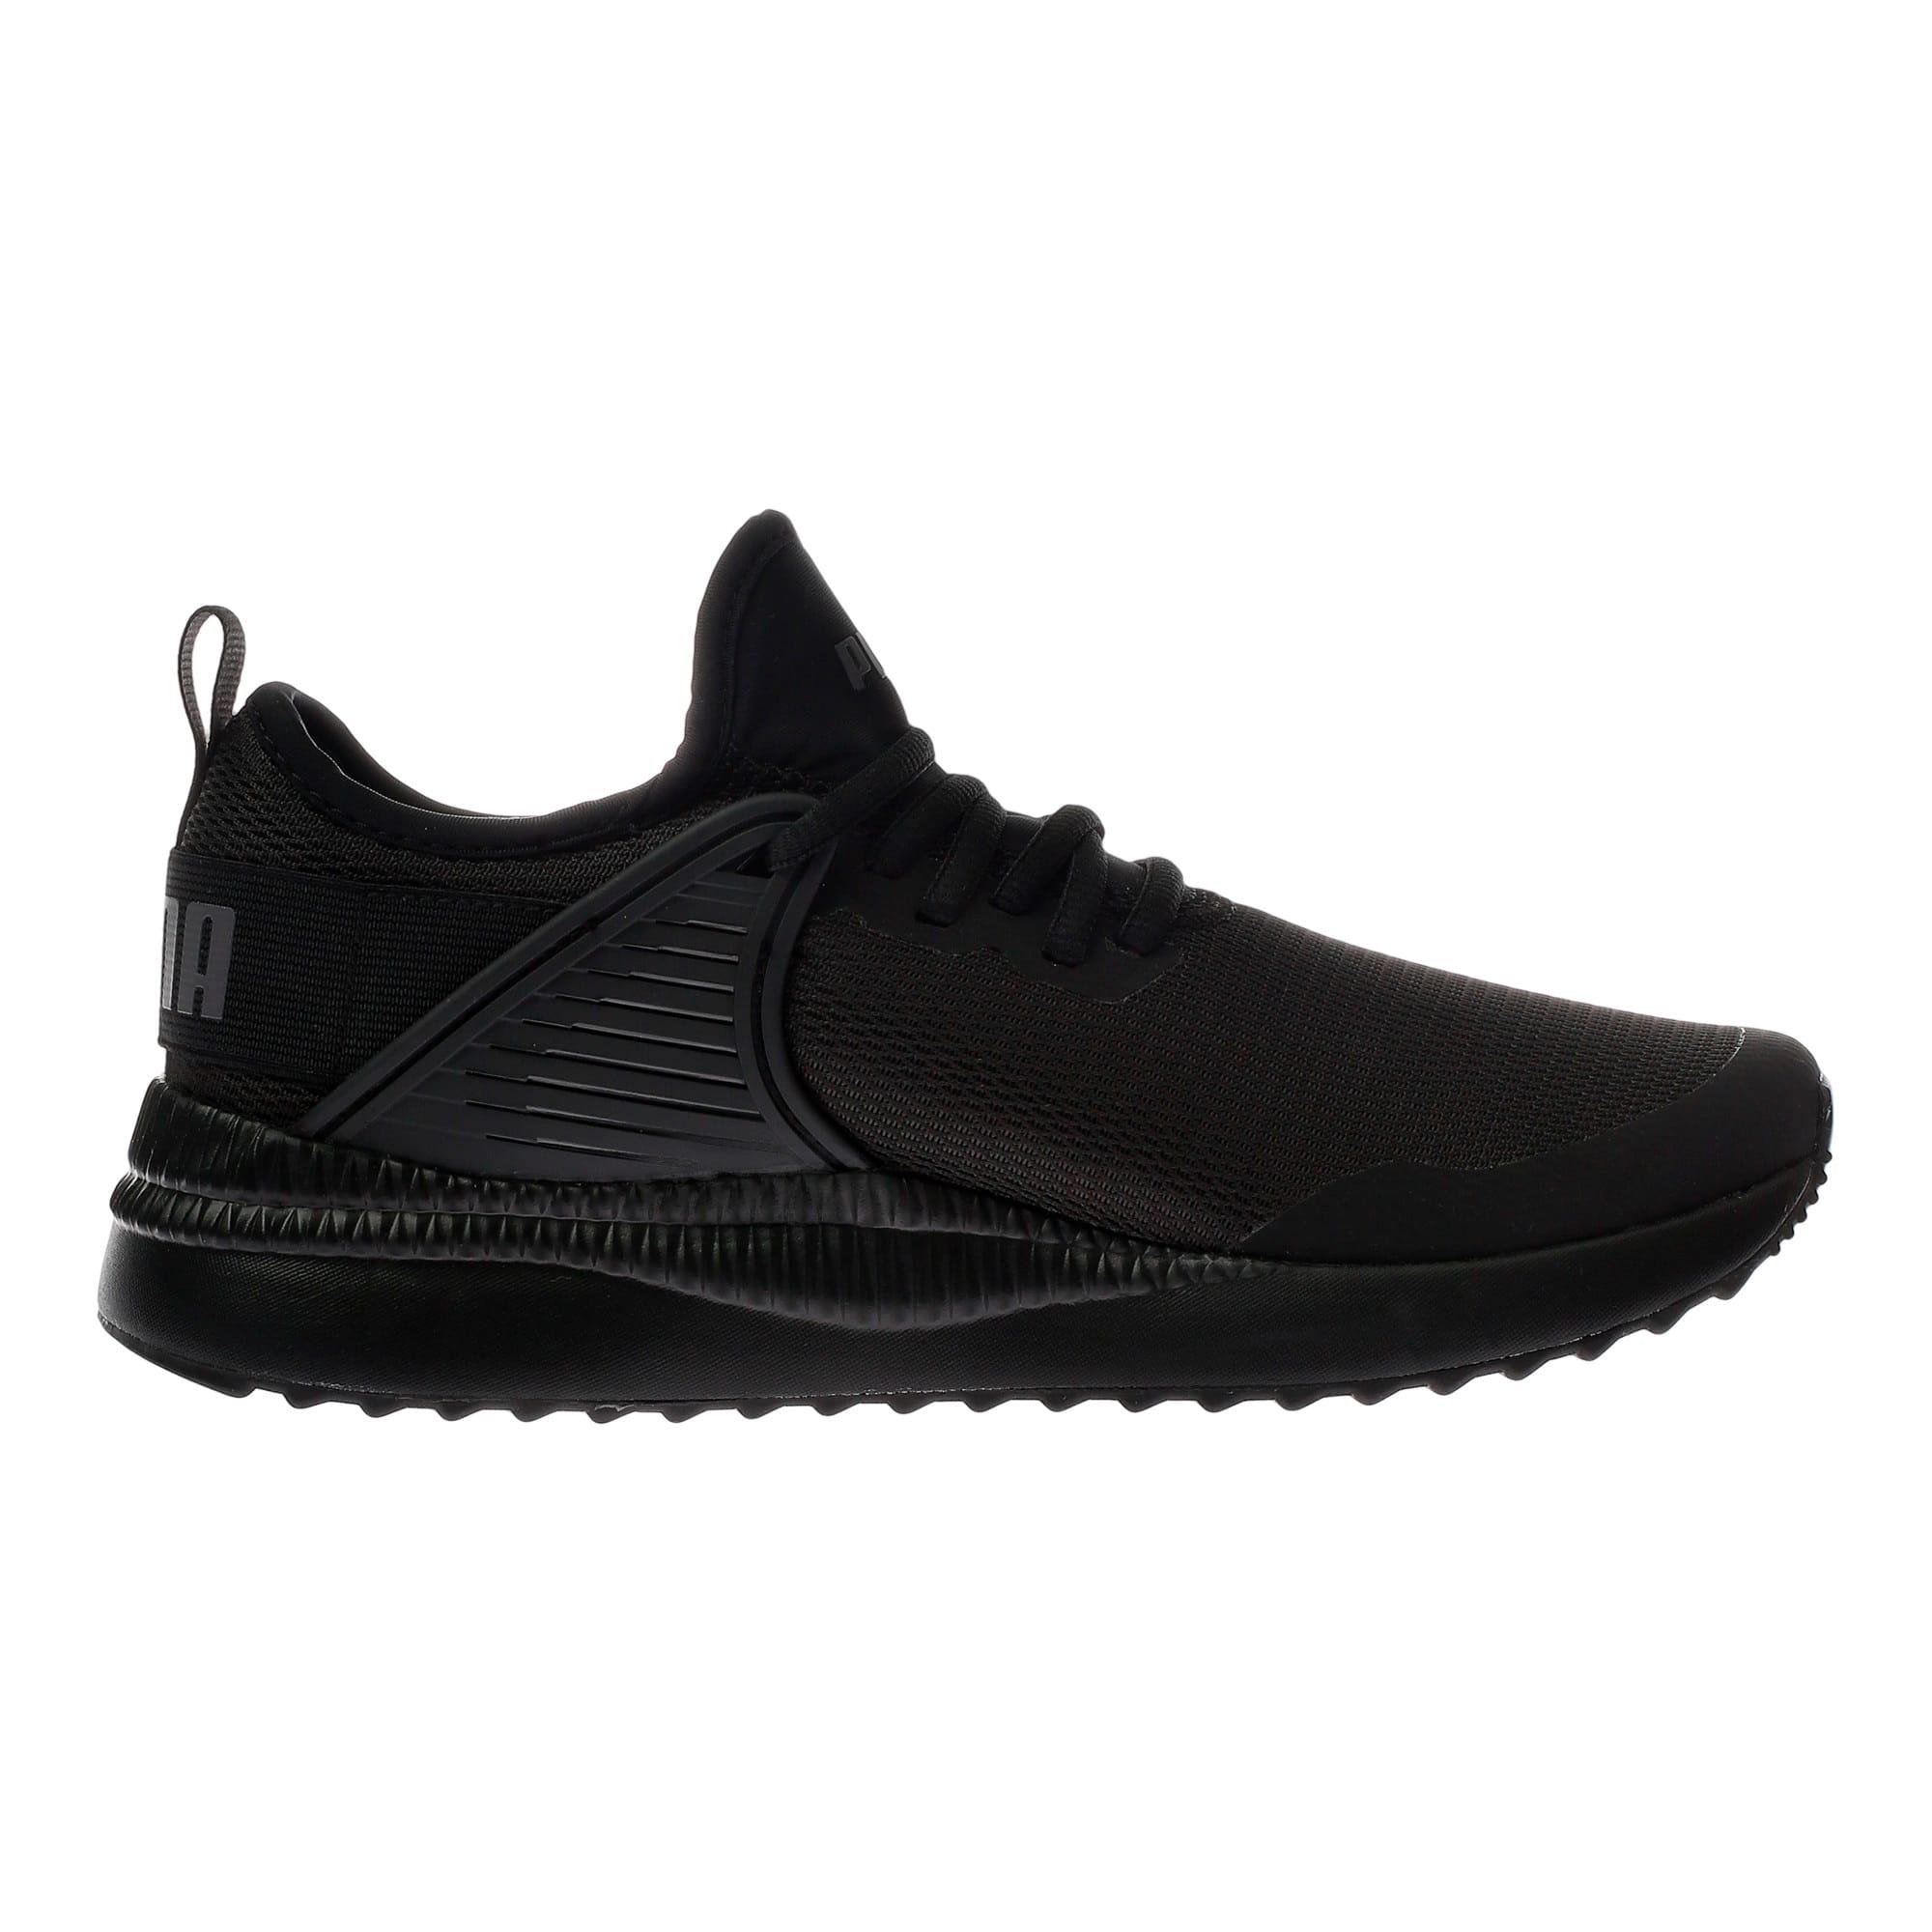 Thumbnail 4 of Pacer Next Cage Sneakers JR, Puma Black-Puma Black, medium